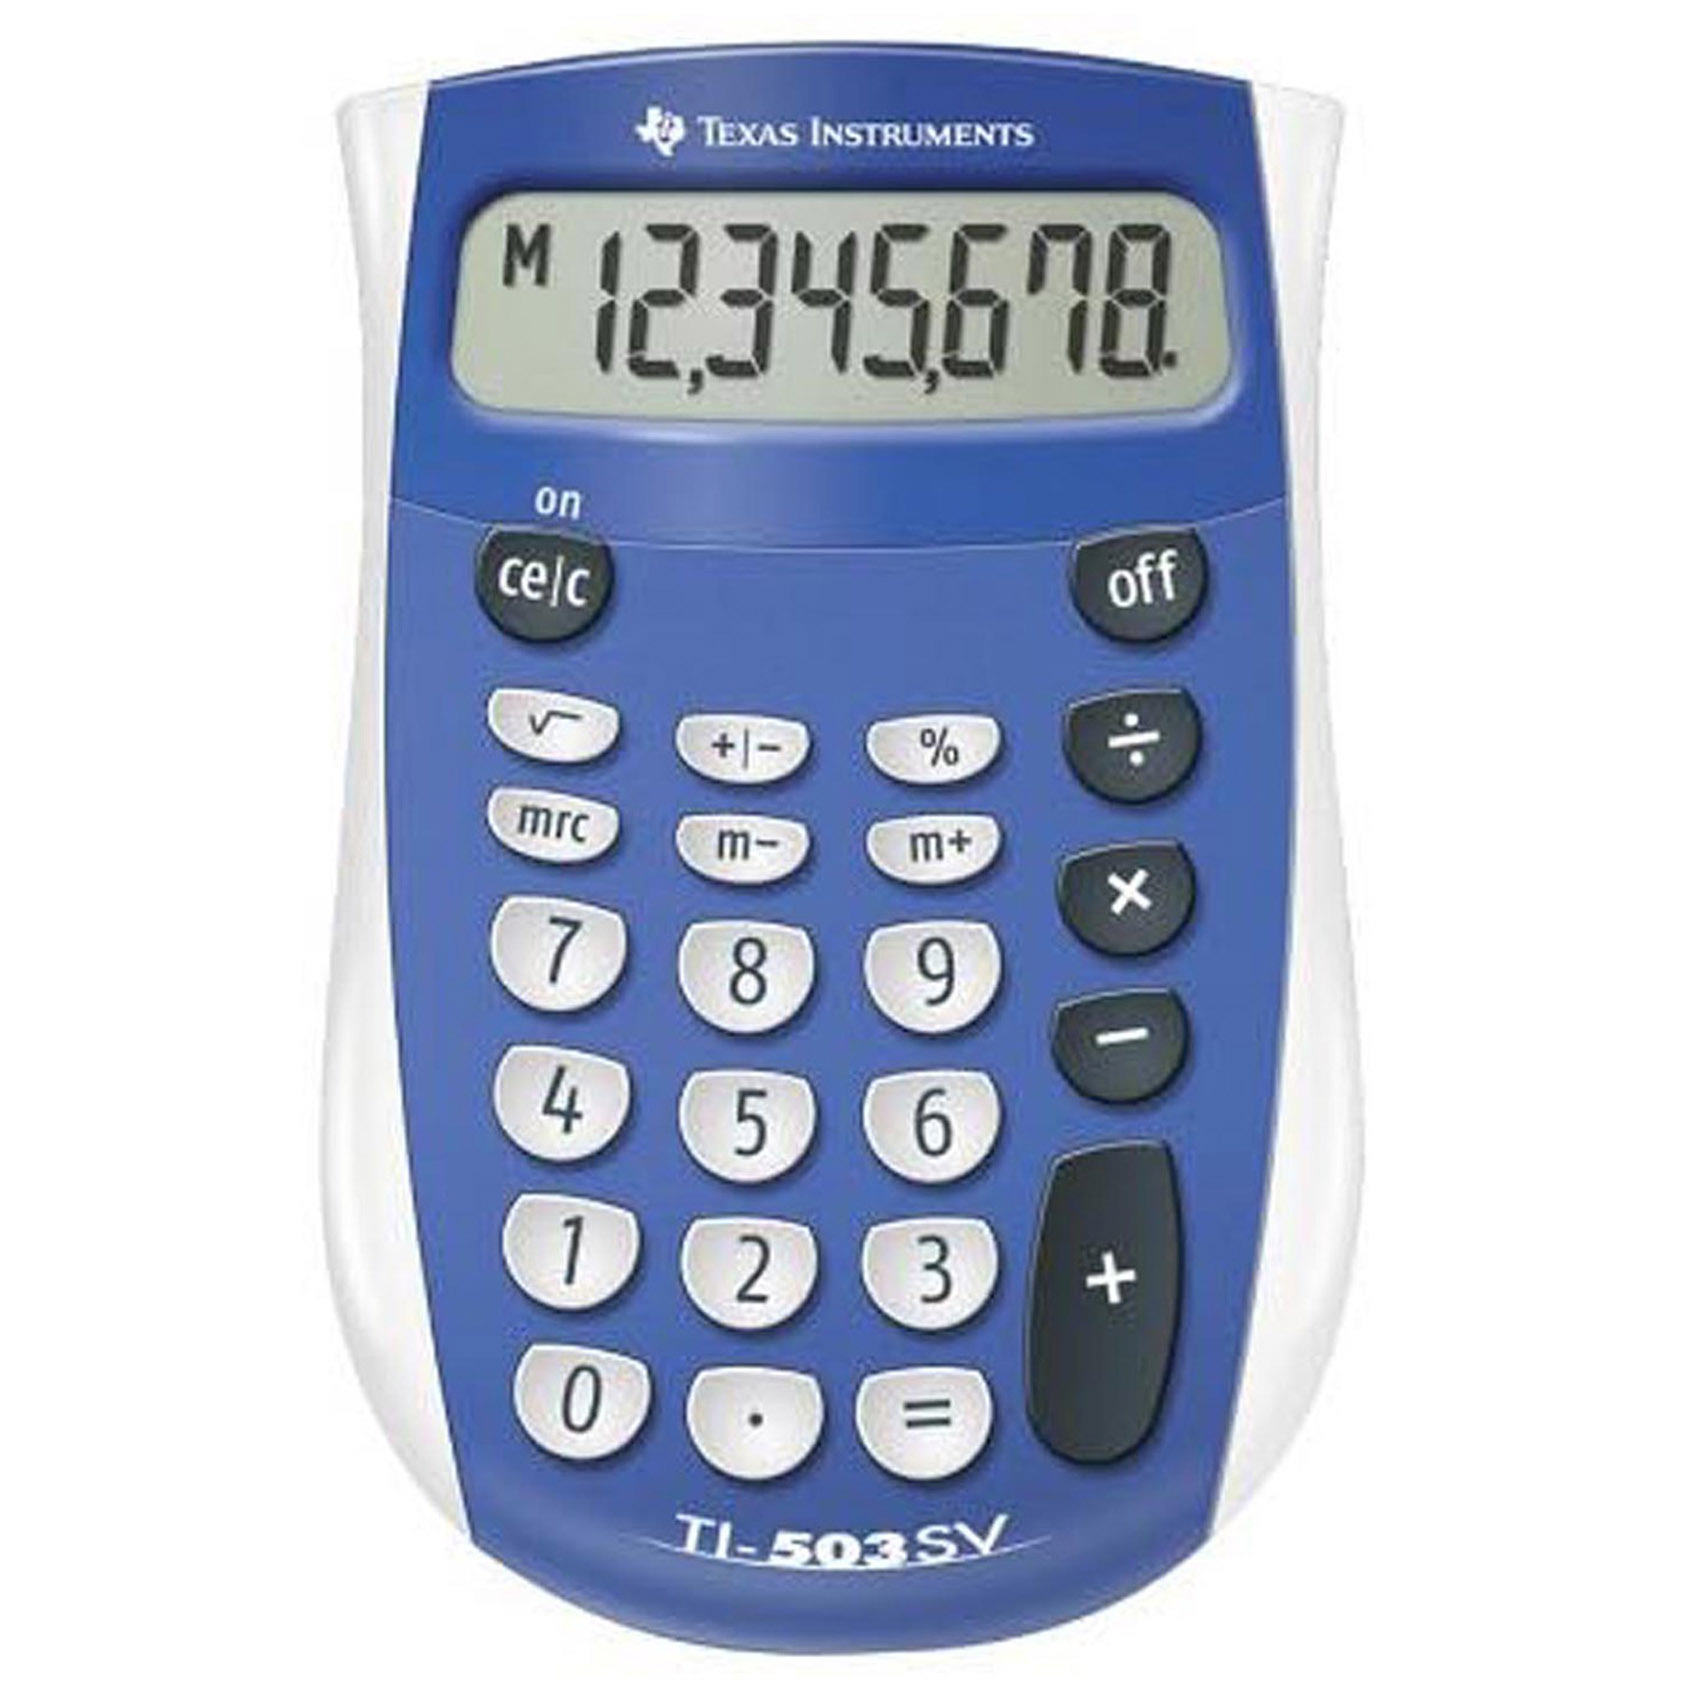 Texas Instruments TI-503 SV Basic Calculator